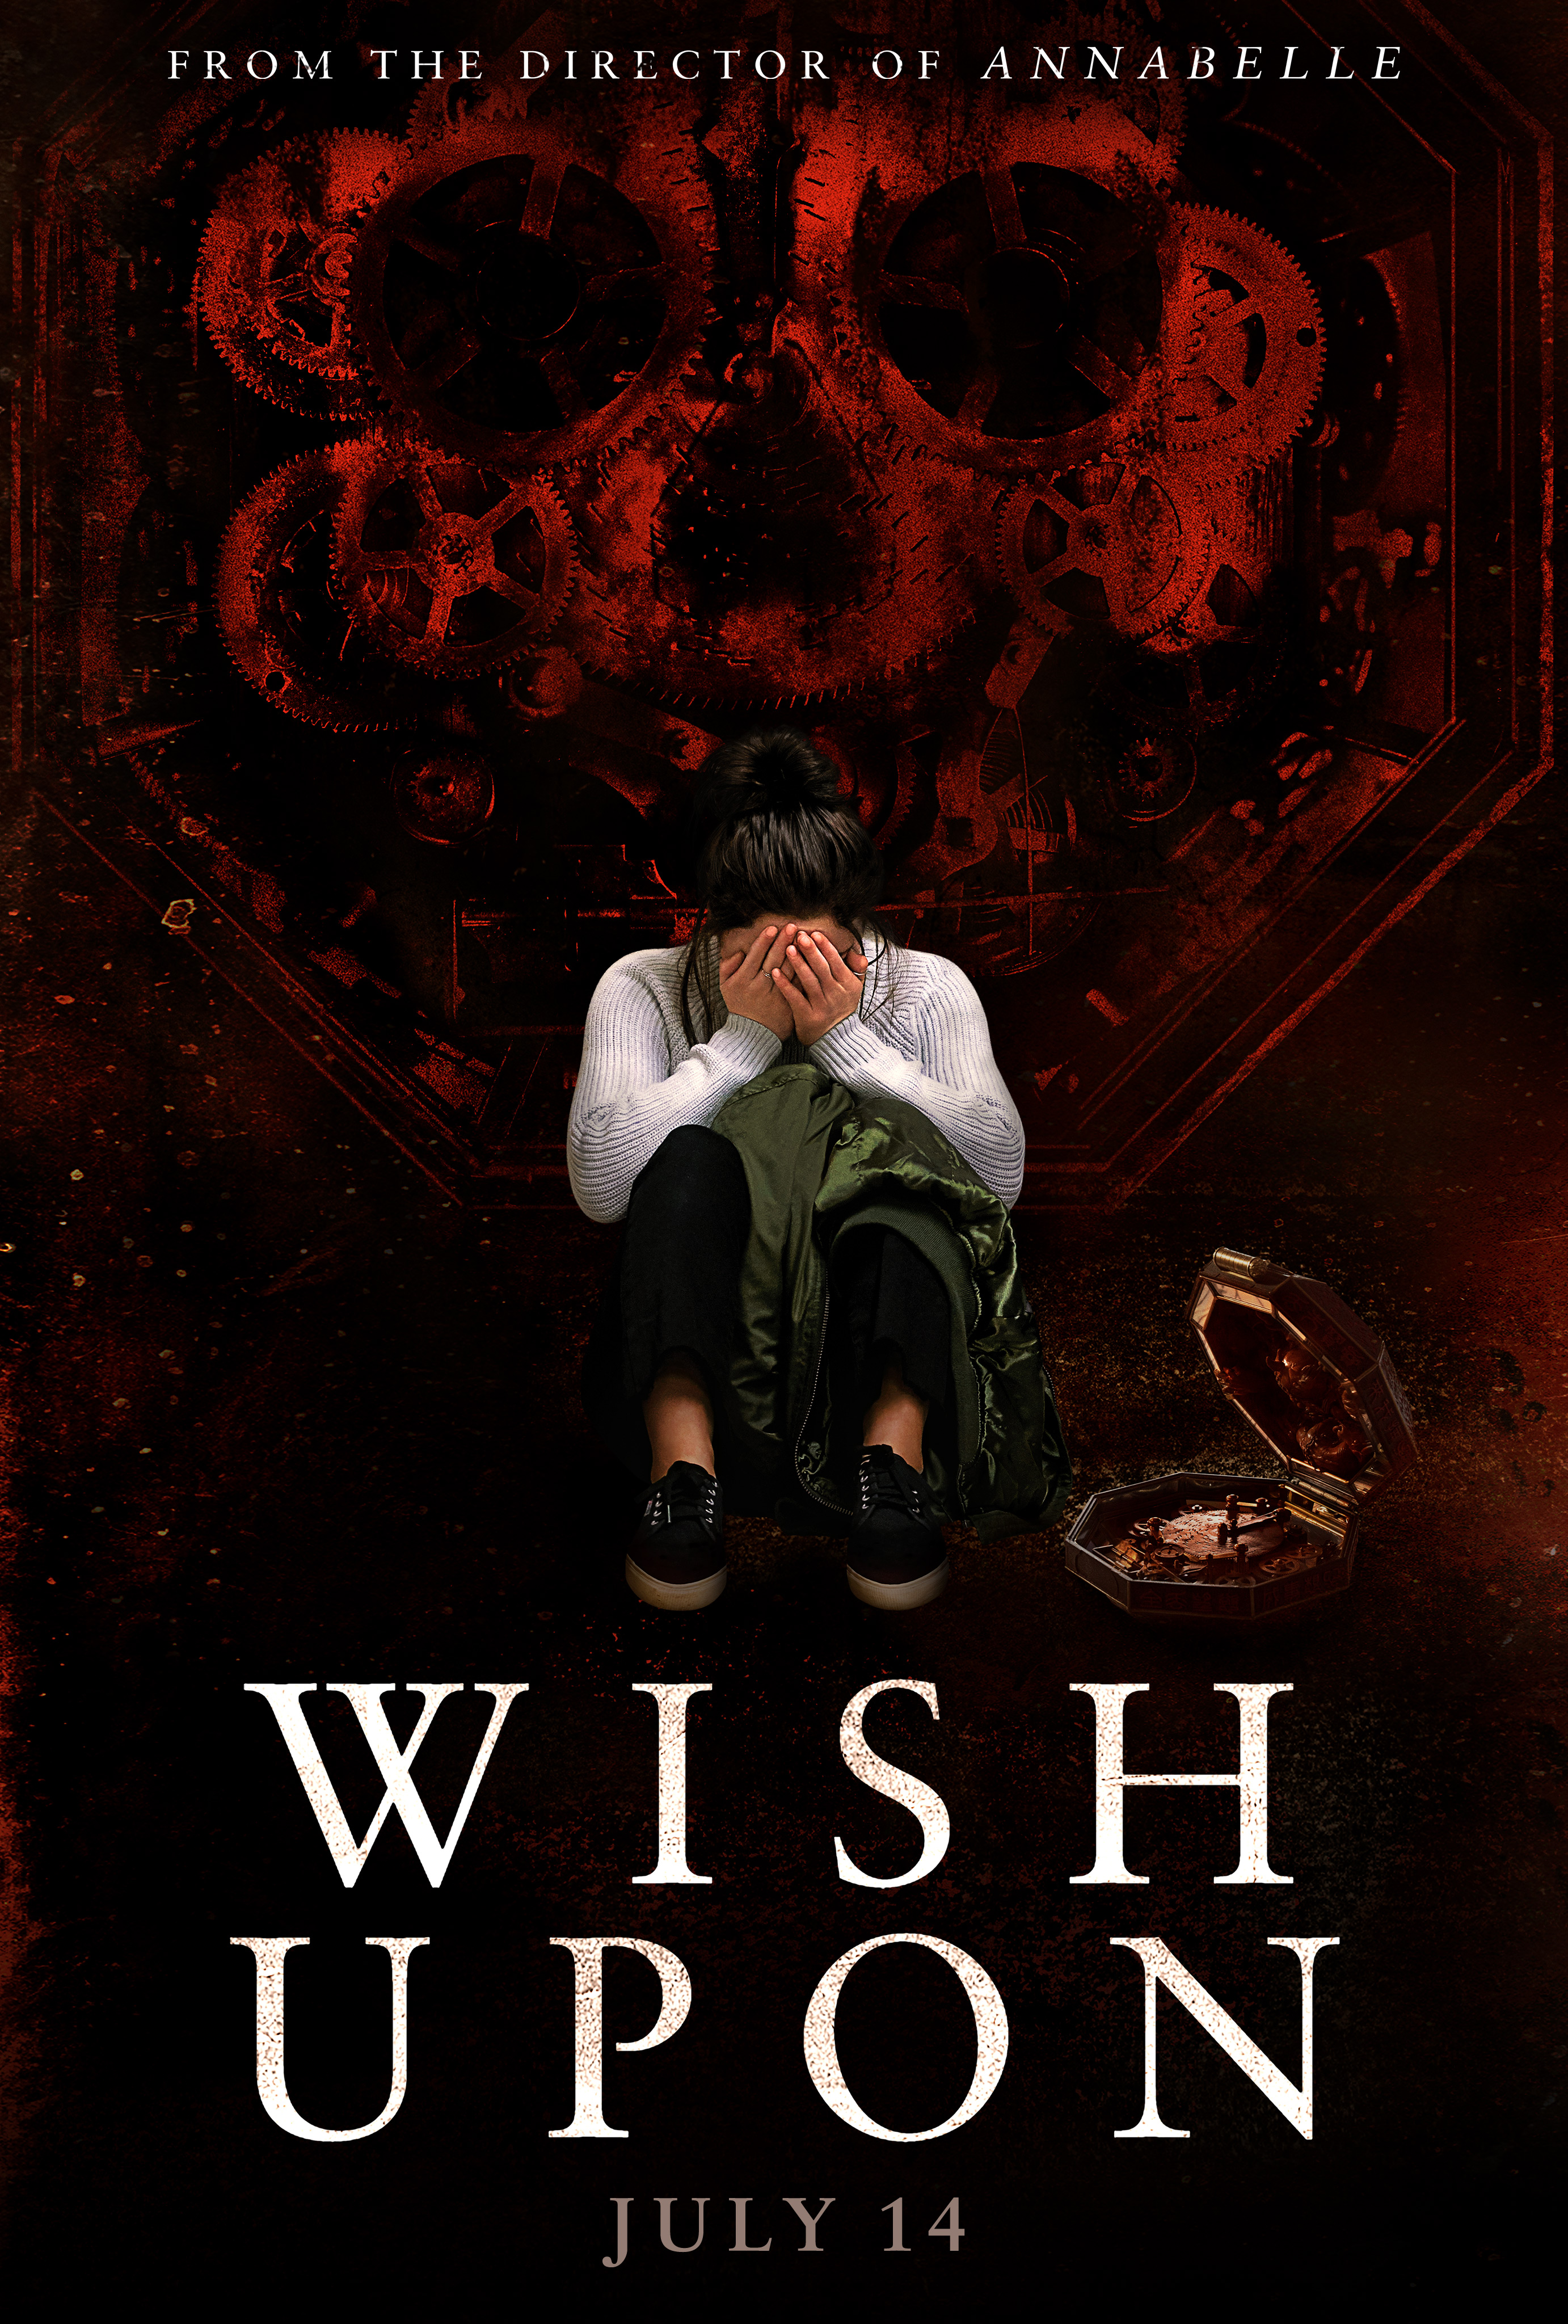 Wish Upon Film